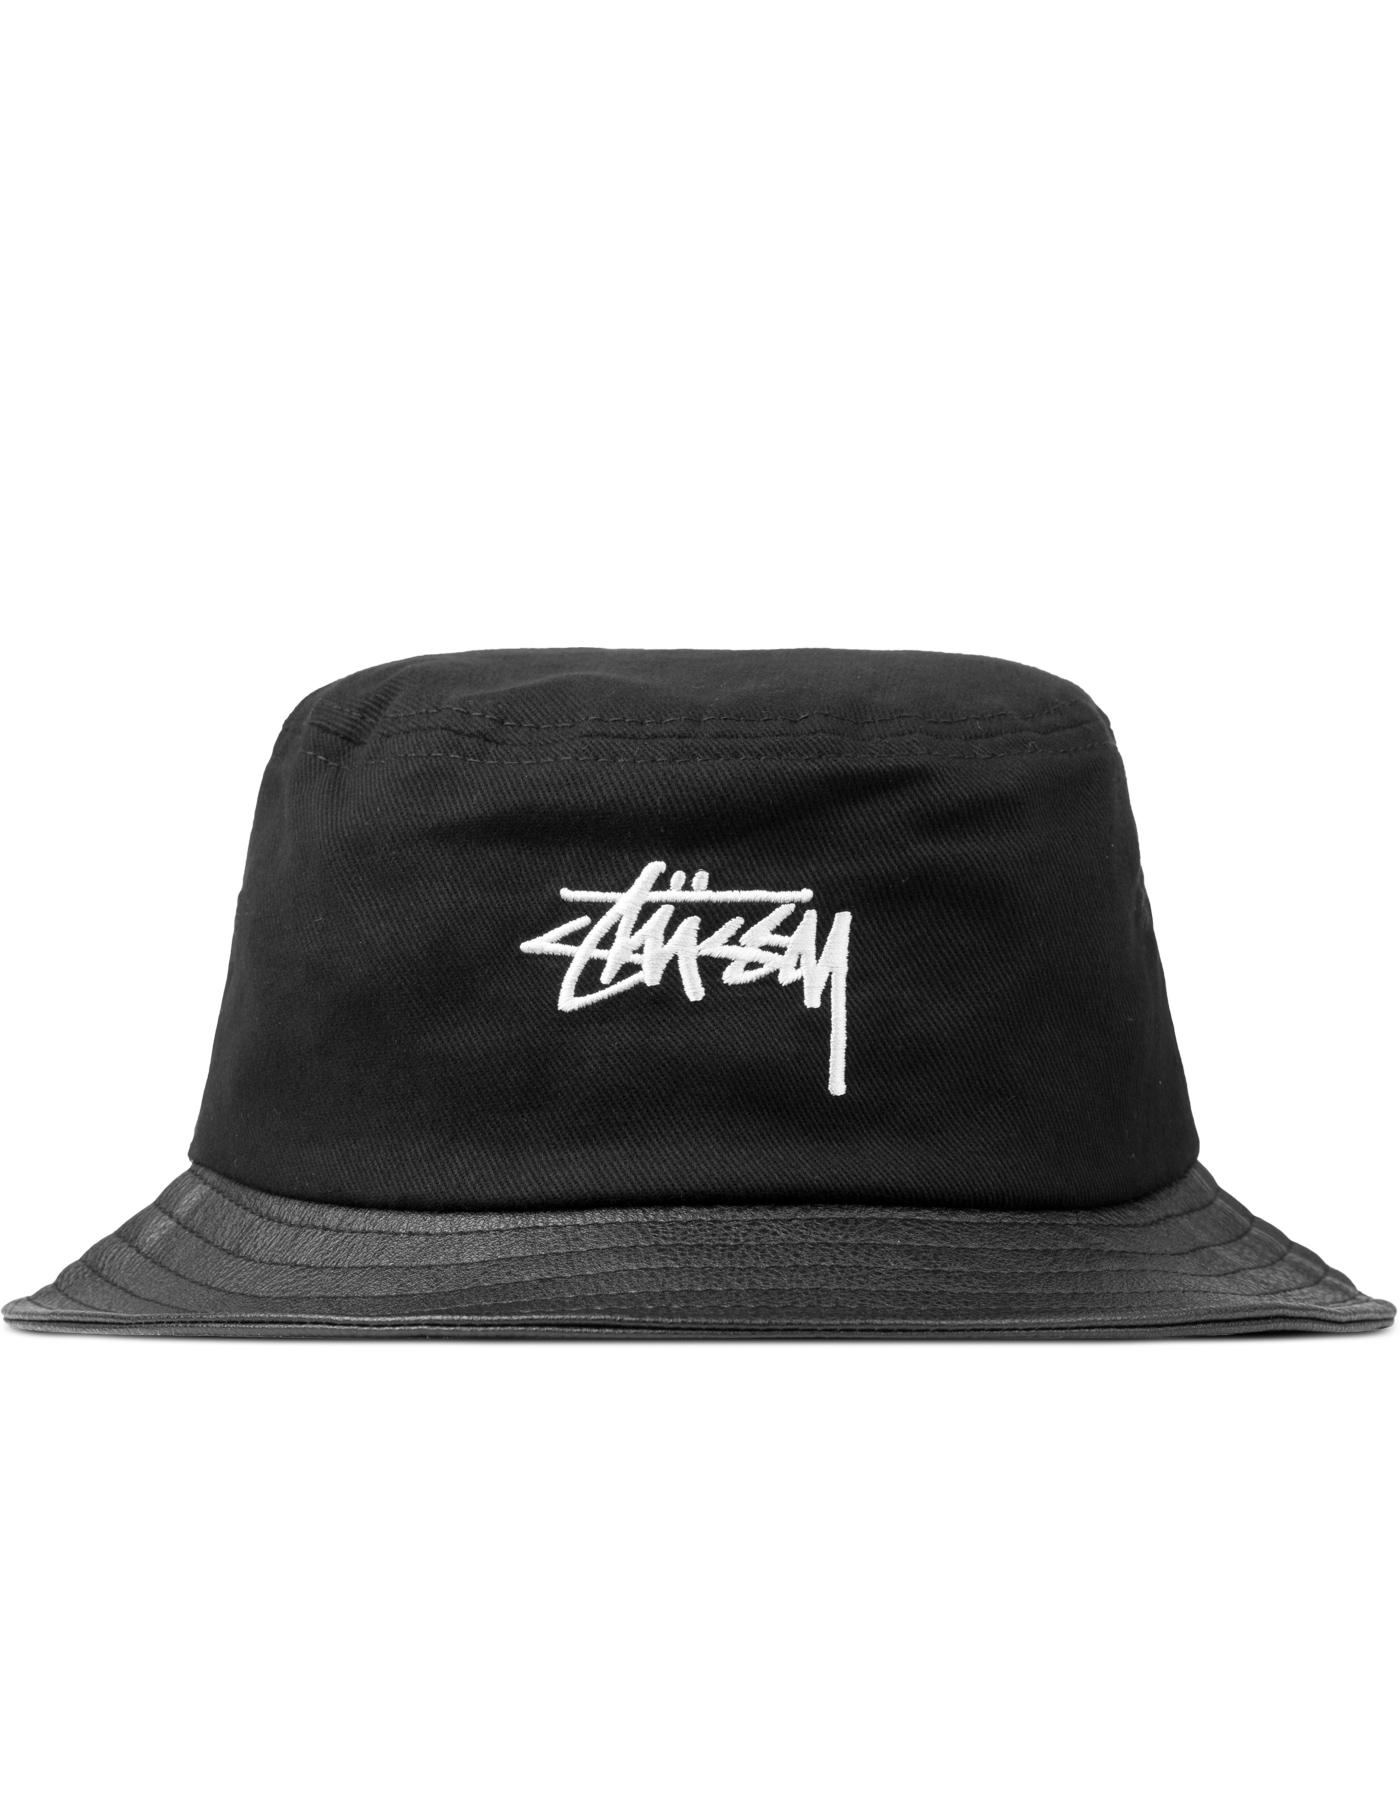 Stussy Black Stock Leather Brim Bucket Hat | HBX.